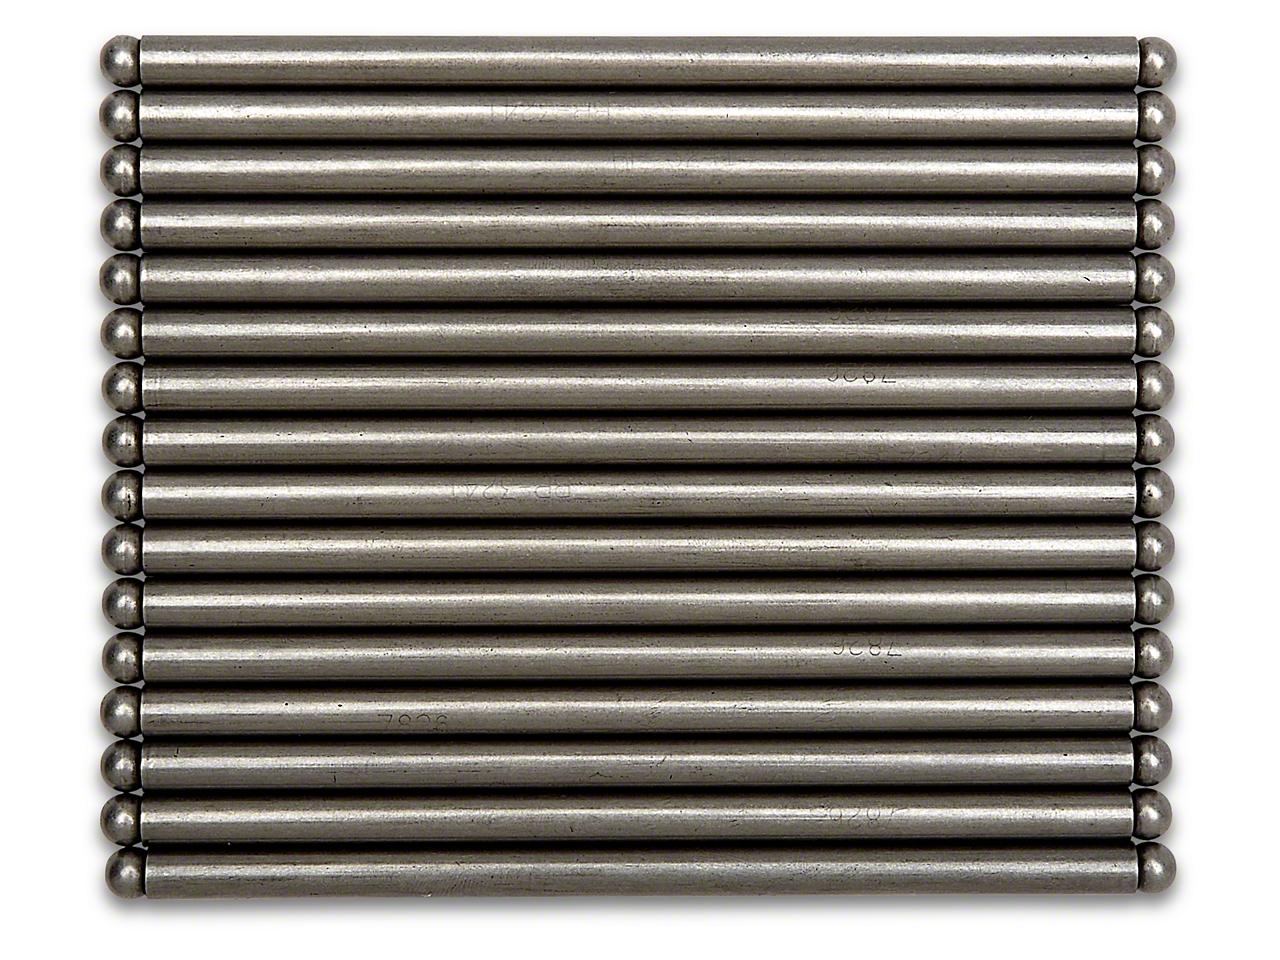 Comp Cams High Energy Hardened Pushrods (85-95 5.0L)